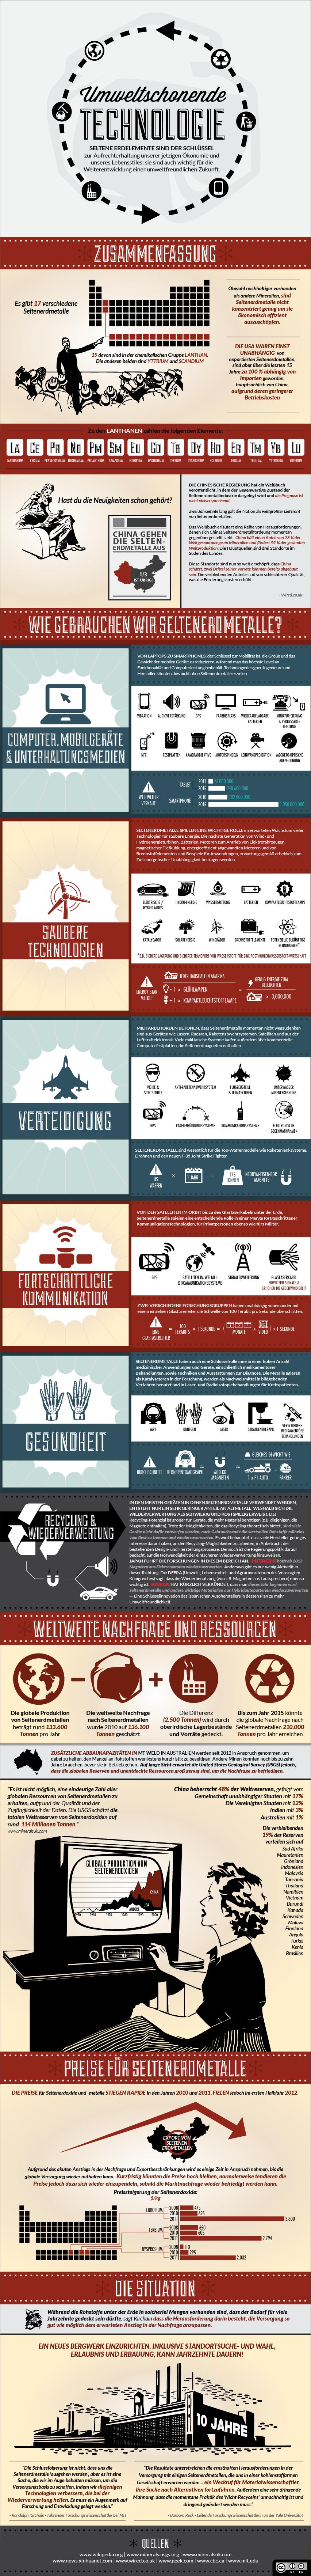 Umweltschonende Technologie